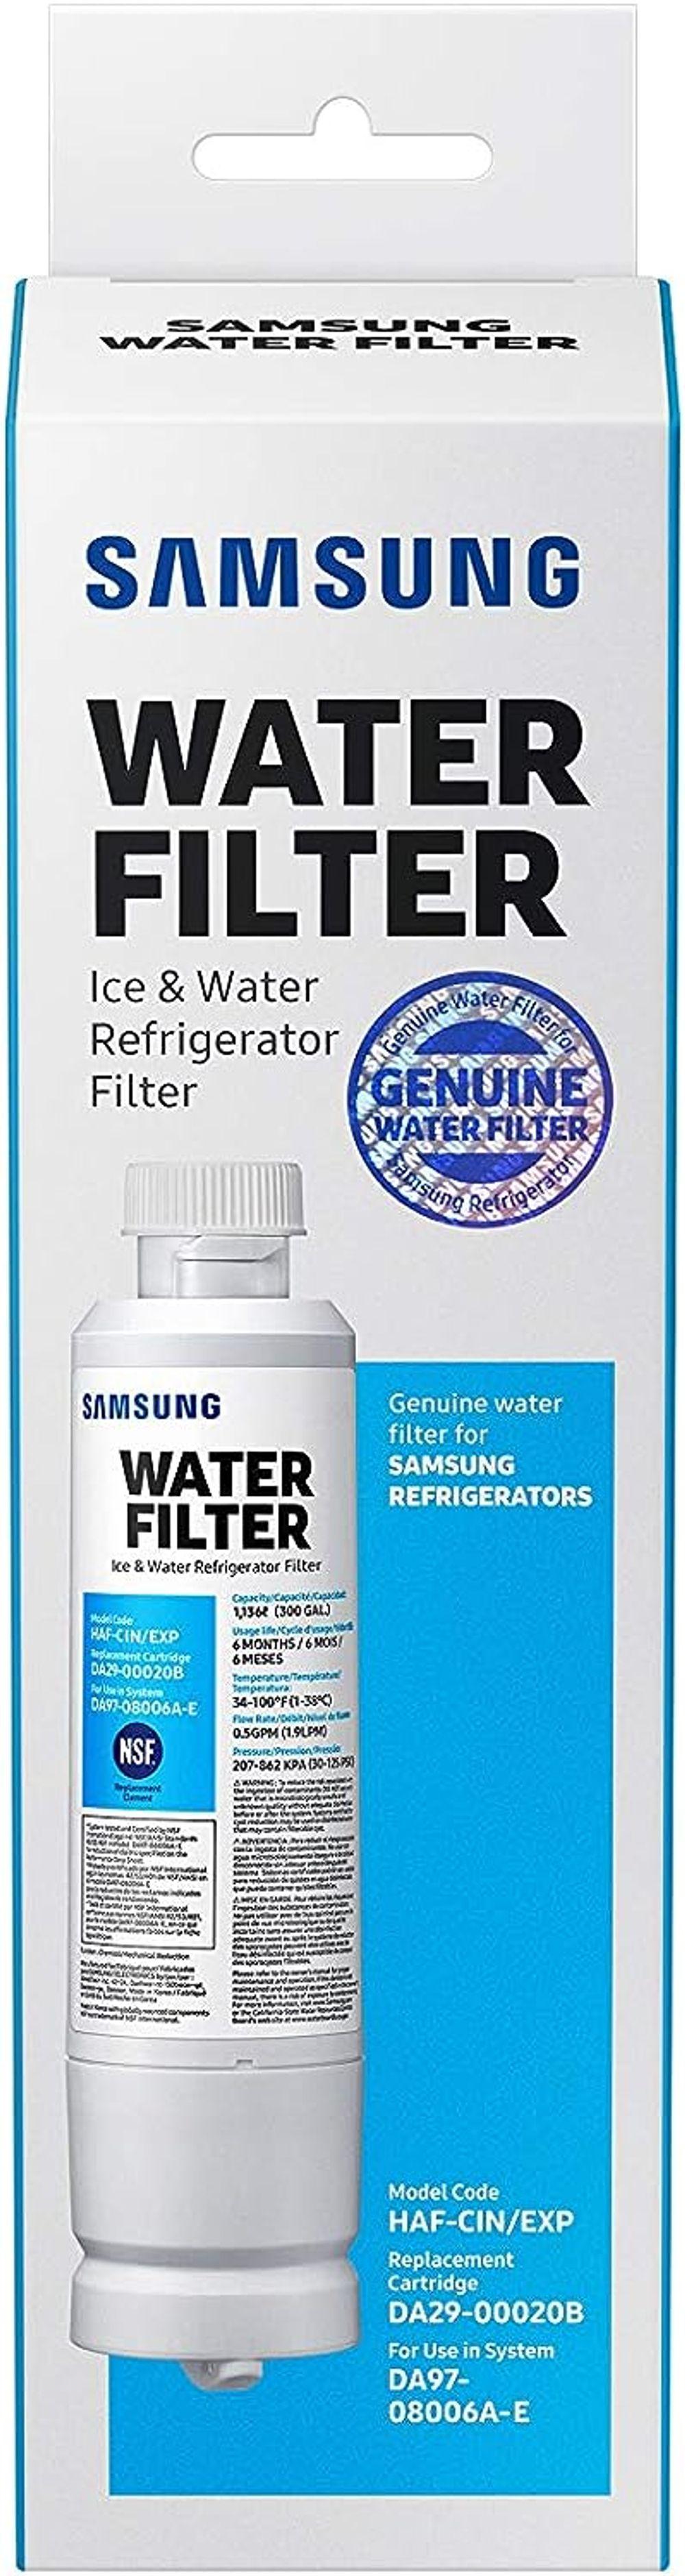 Samsung Da29-00020b-1P Refrigerator Water Filter 1 Pack (Packaging may vary)